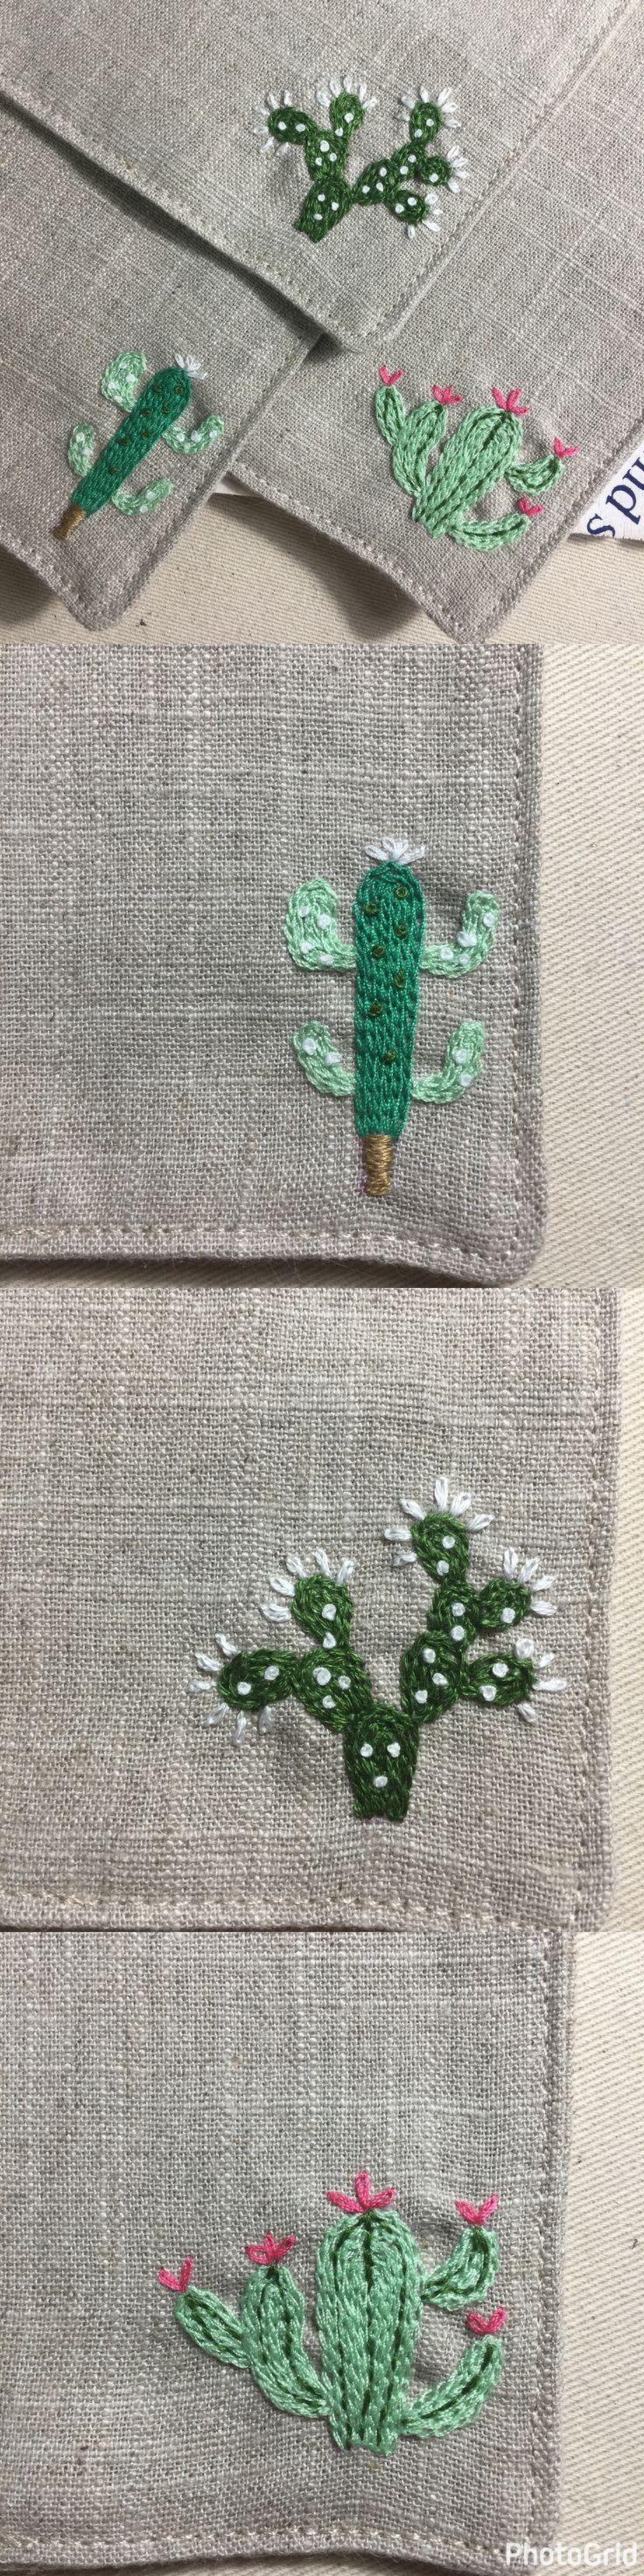 Handmade cactus coasters ~ cute!